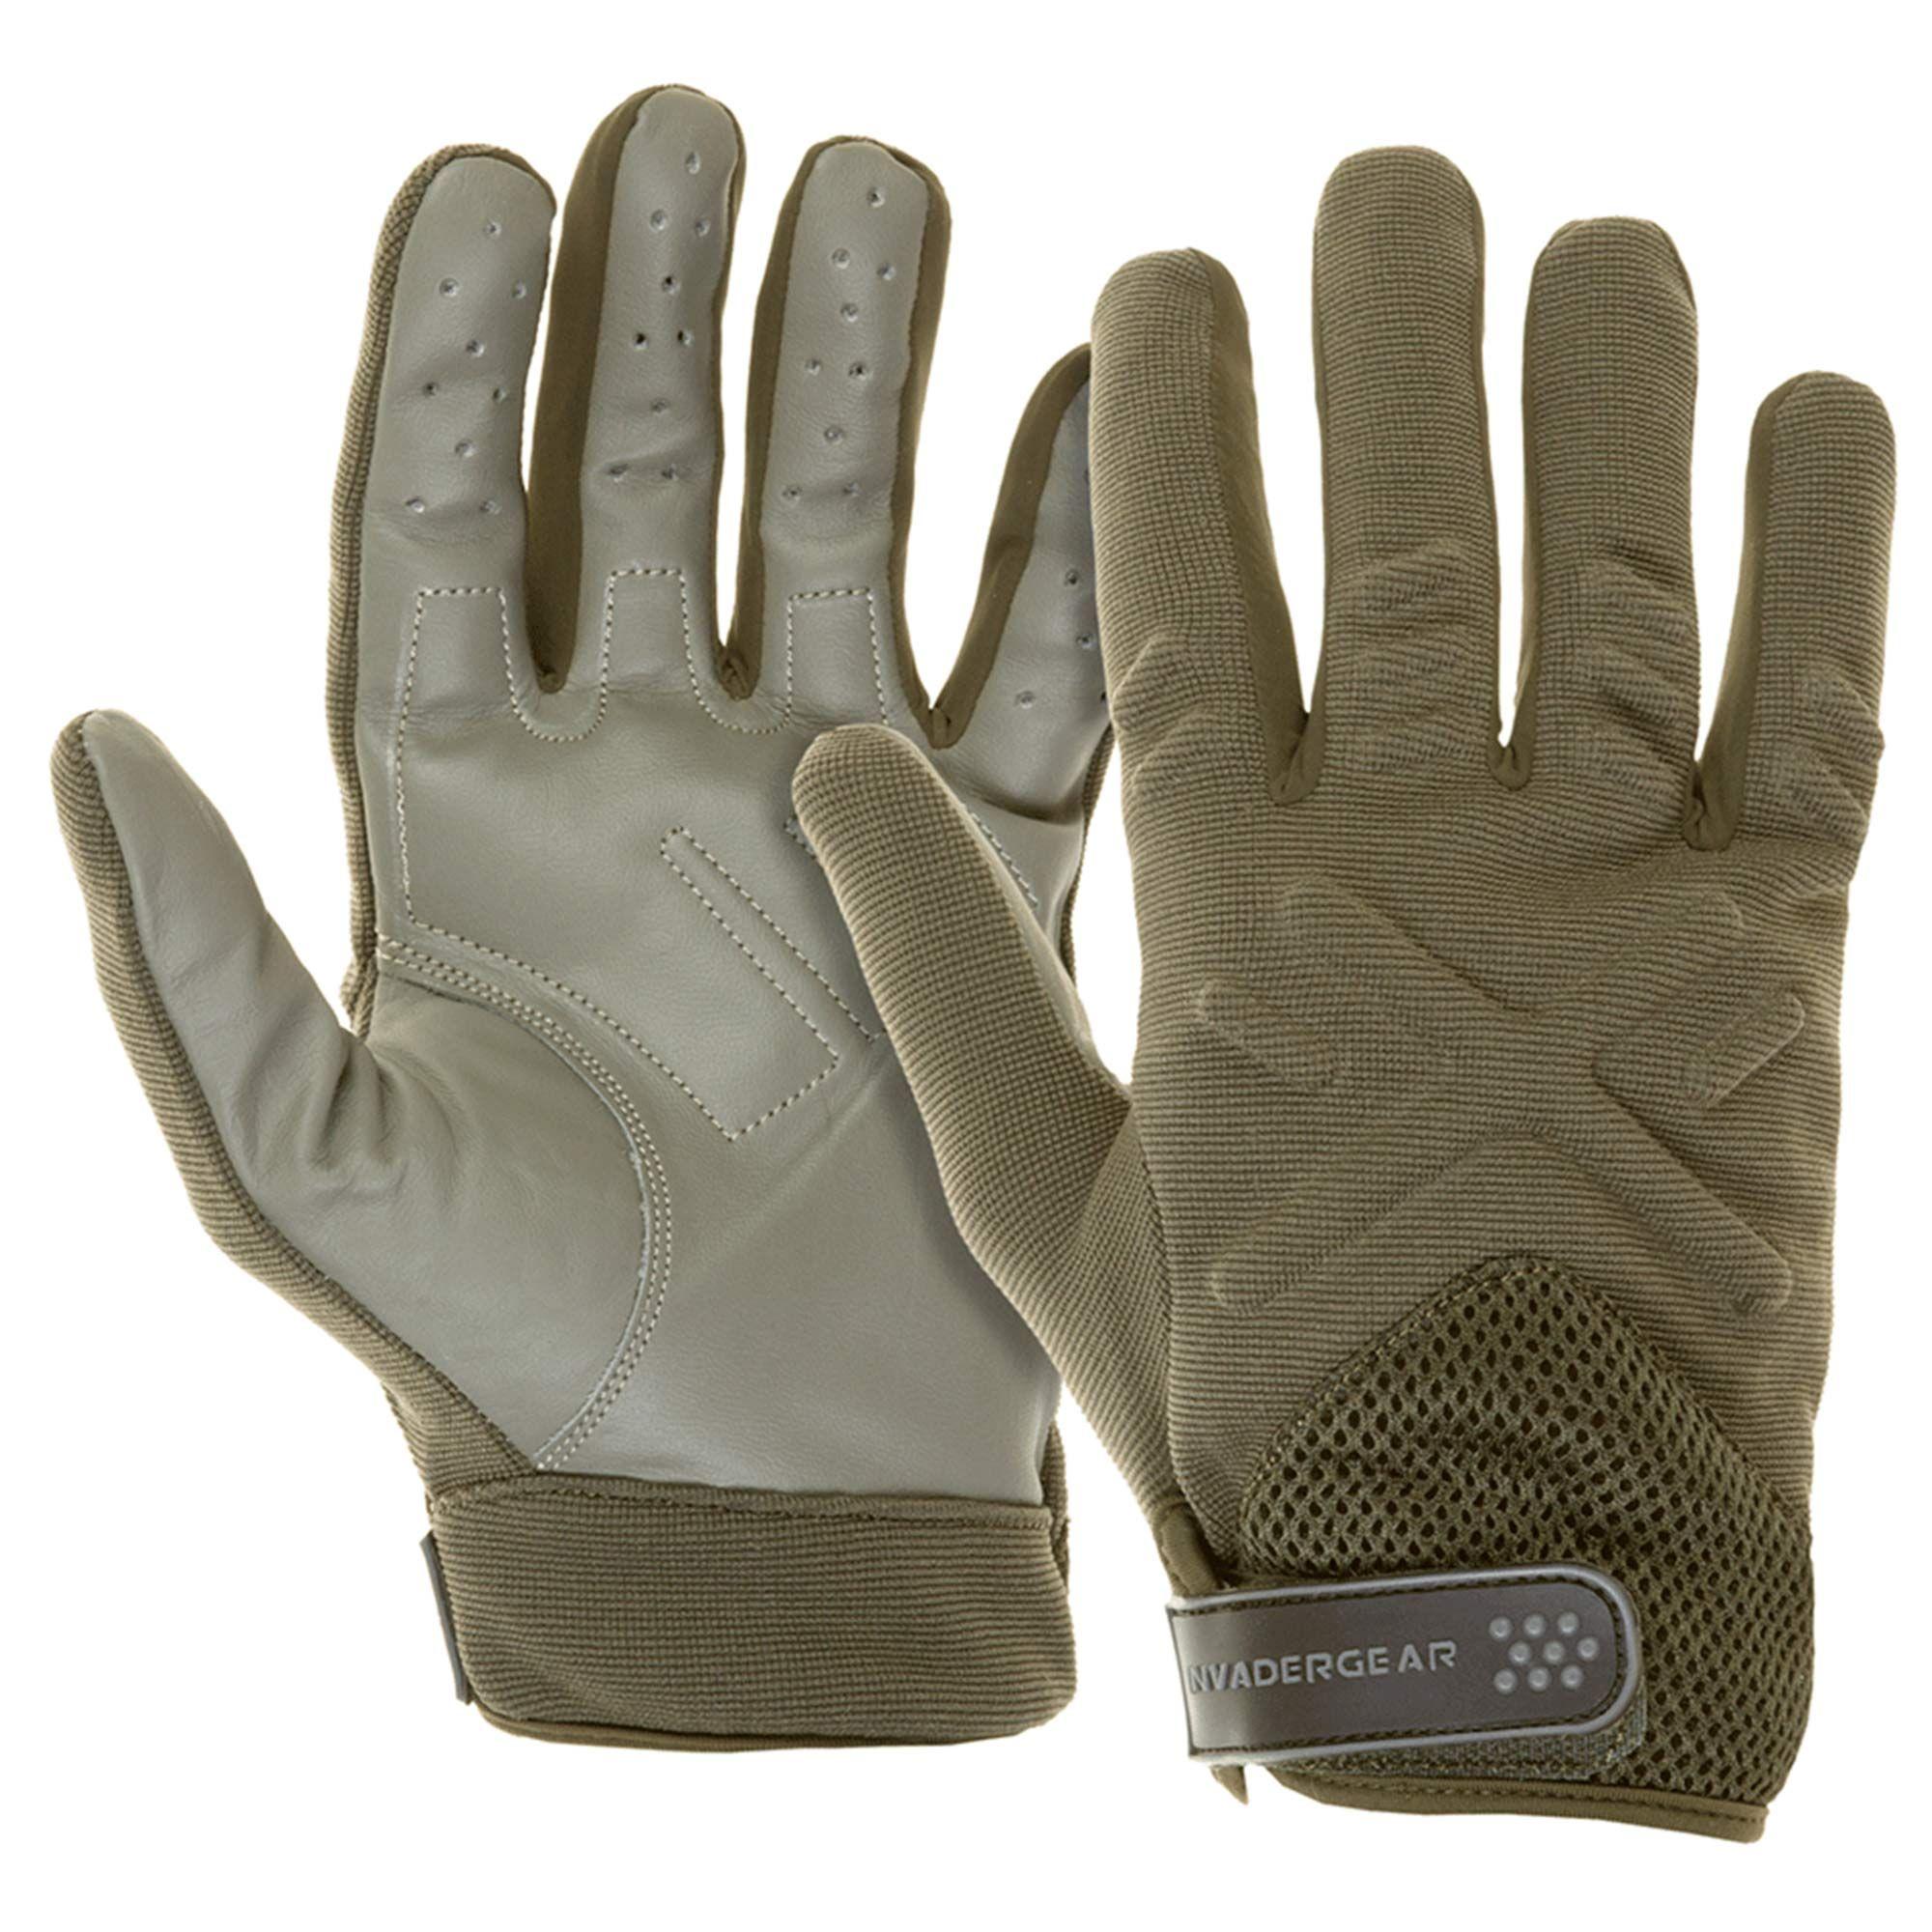 Mechanix Wear Handschuhe Army BW US Tactical M-Pact Gloves Multicam